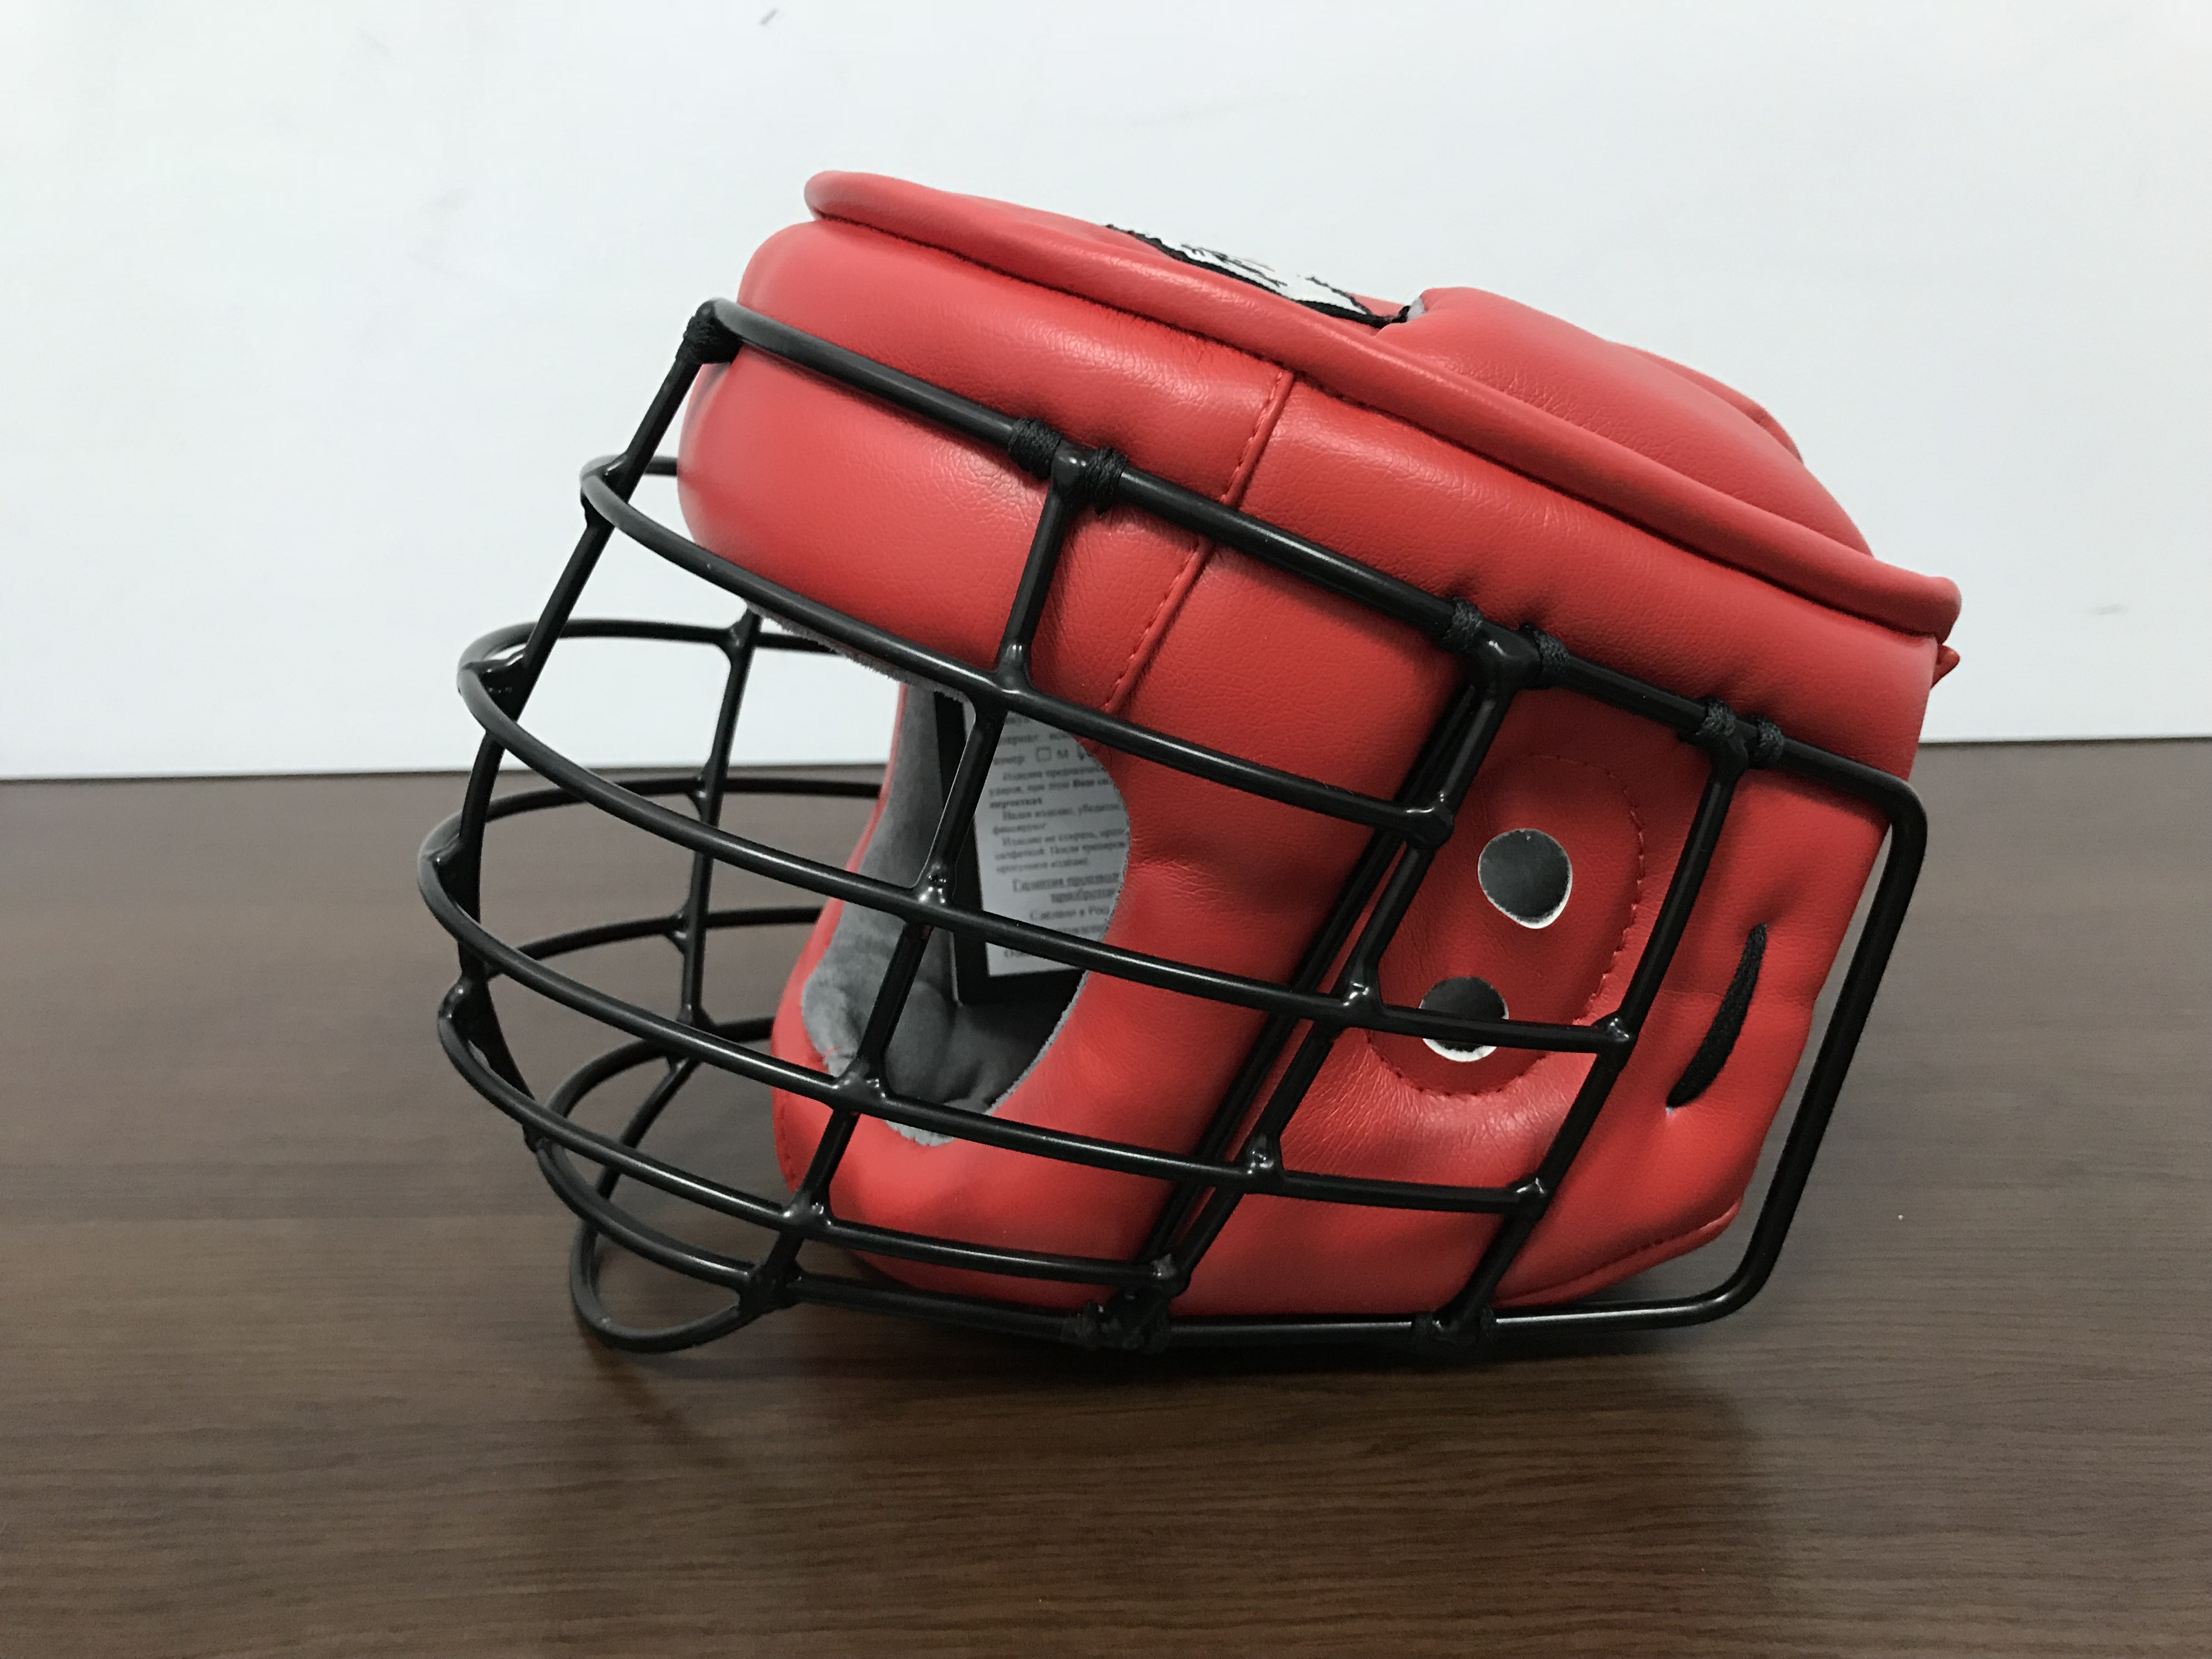 Шлем для армейского рукопашного боя рэй-спорт